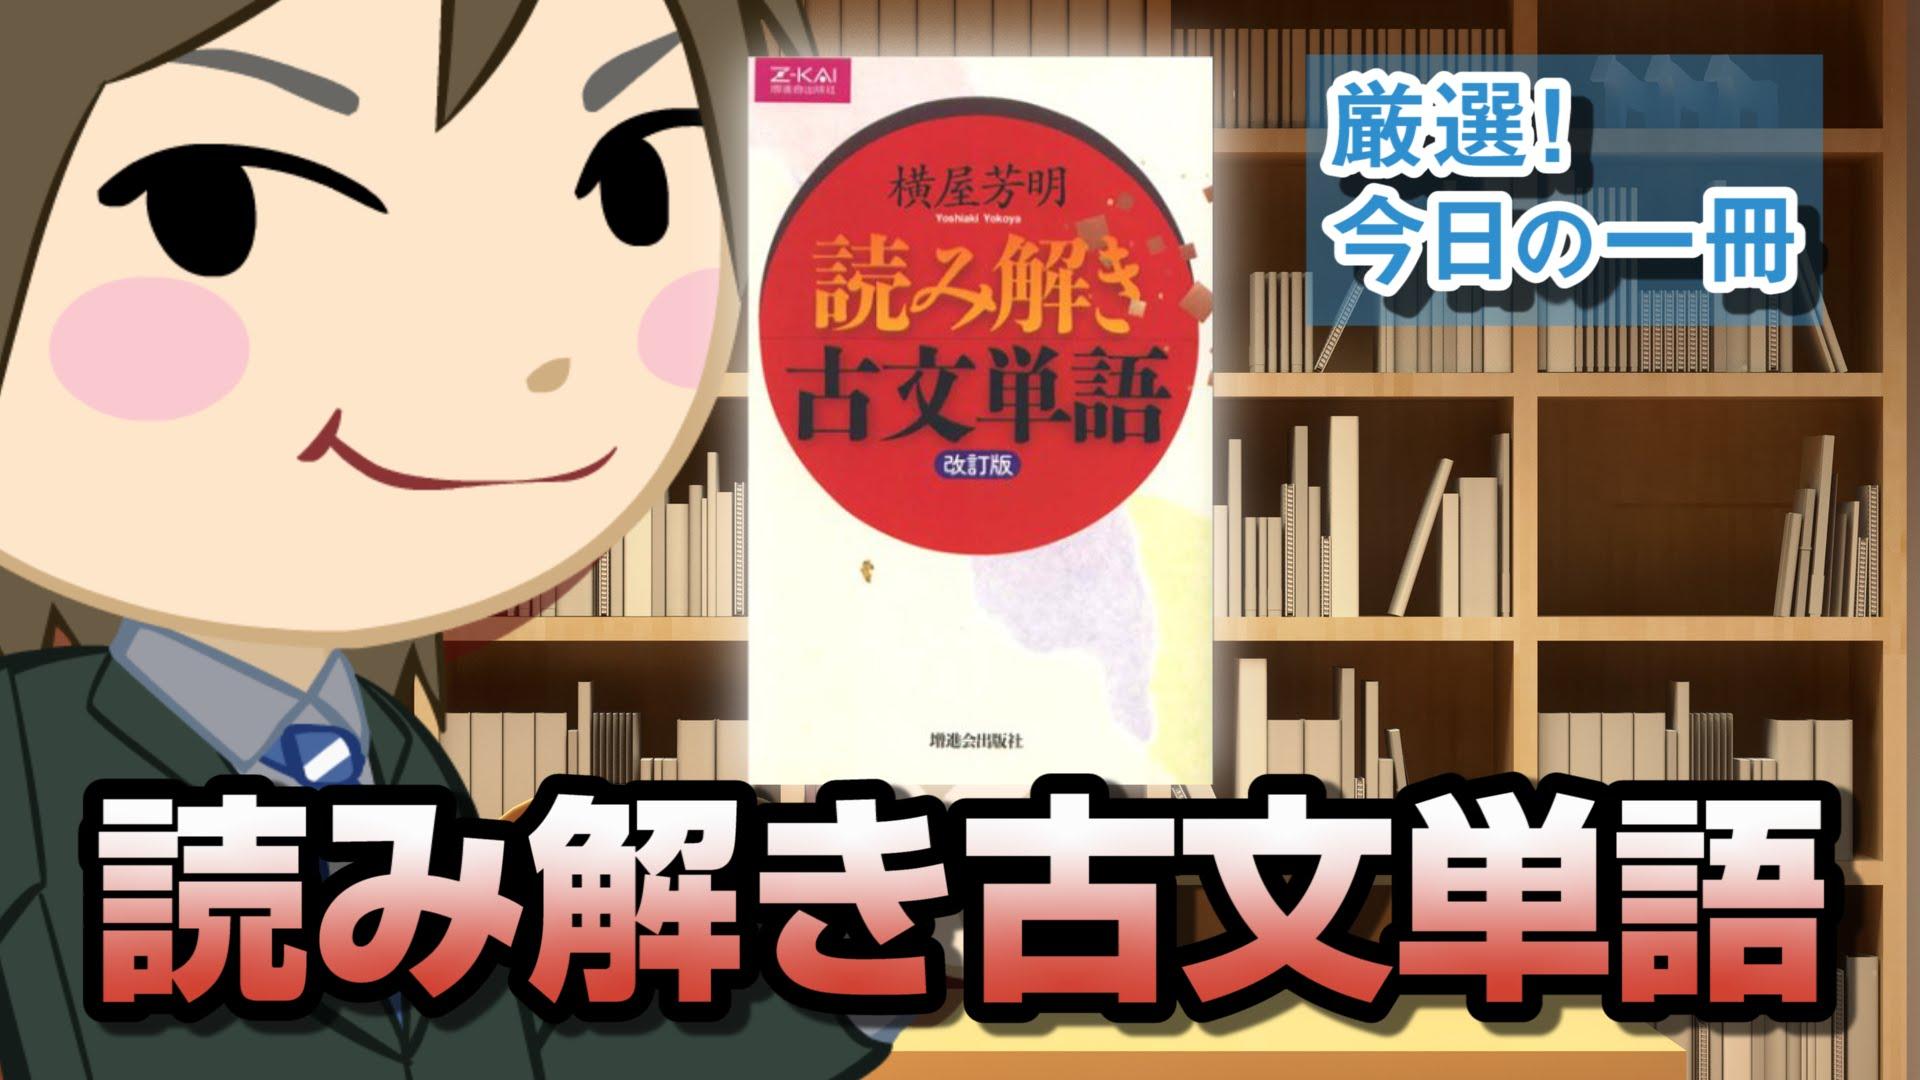 読み解き古文単語 改訂版 武田塾厳選!今日の一冊